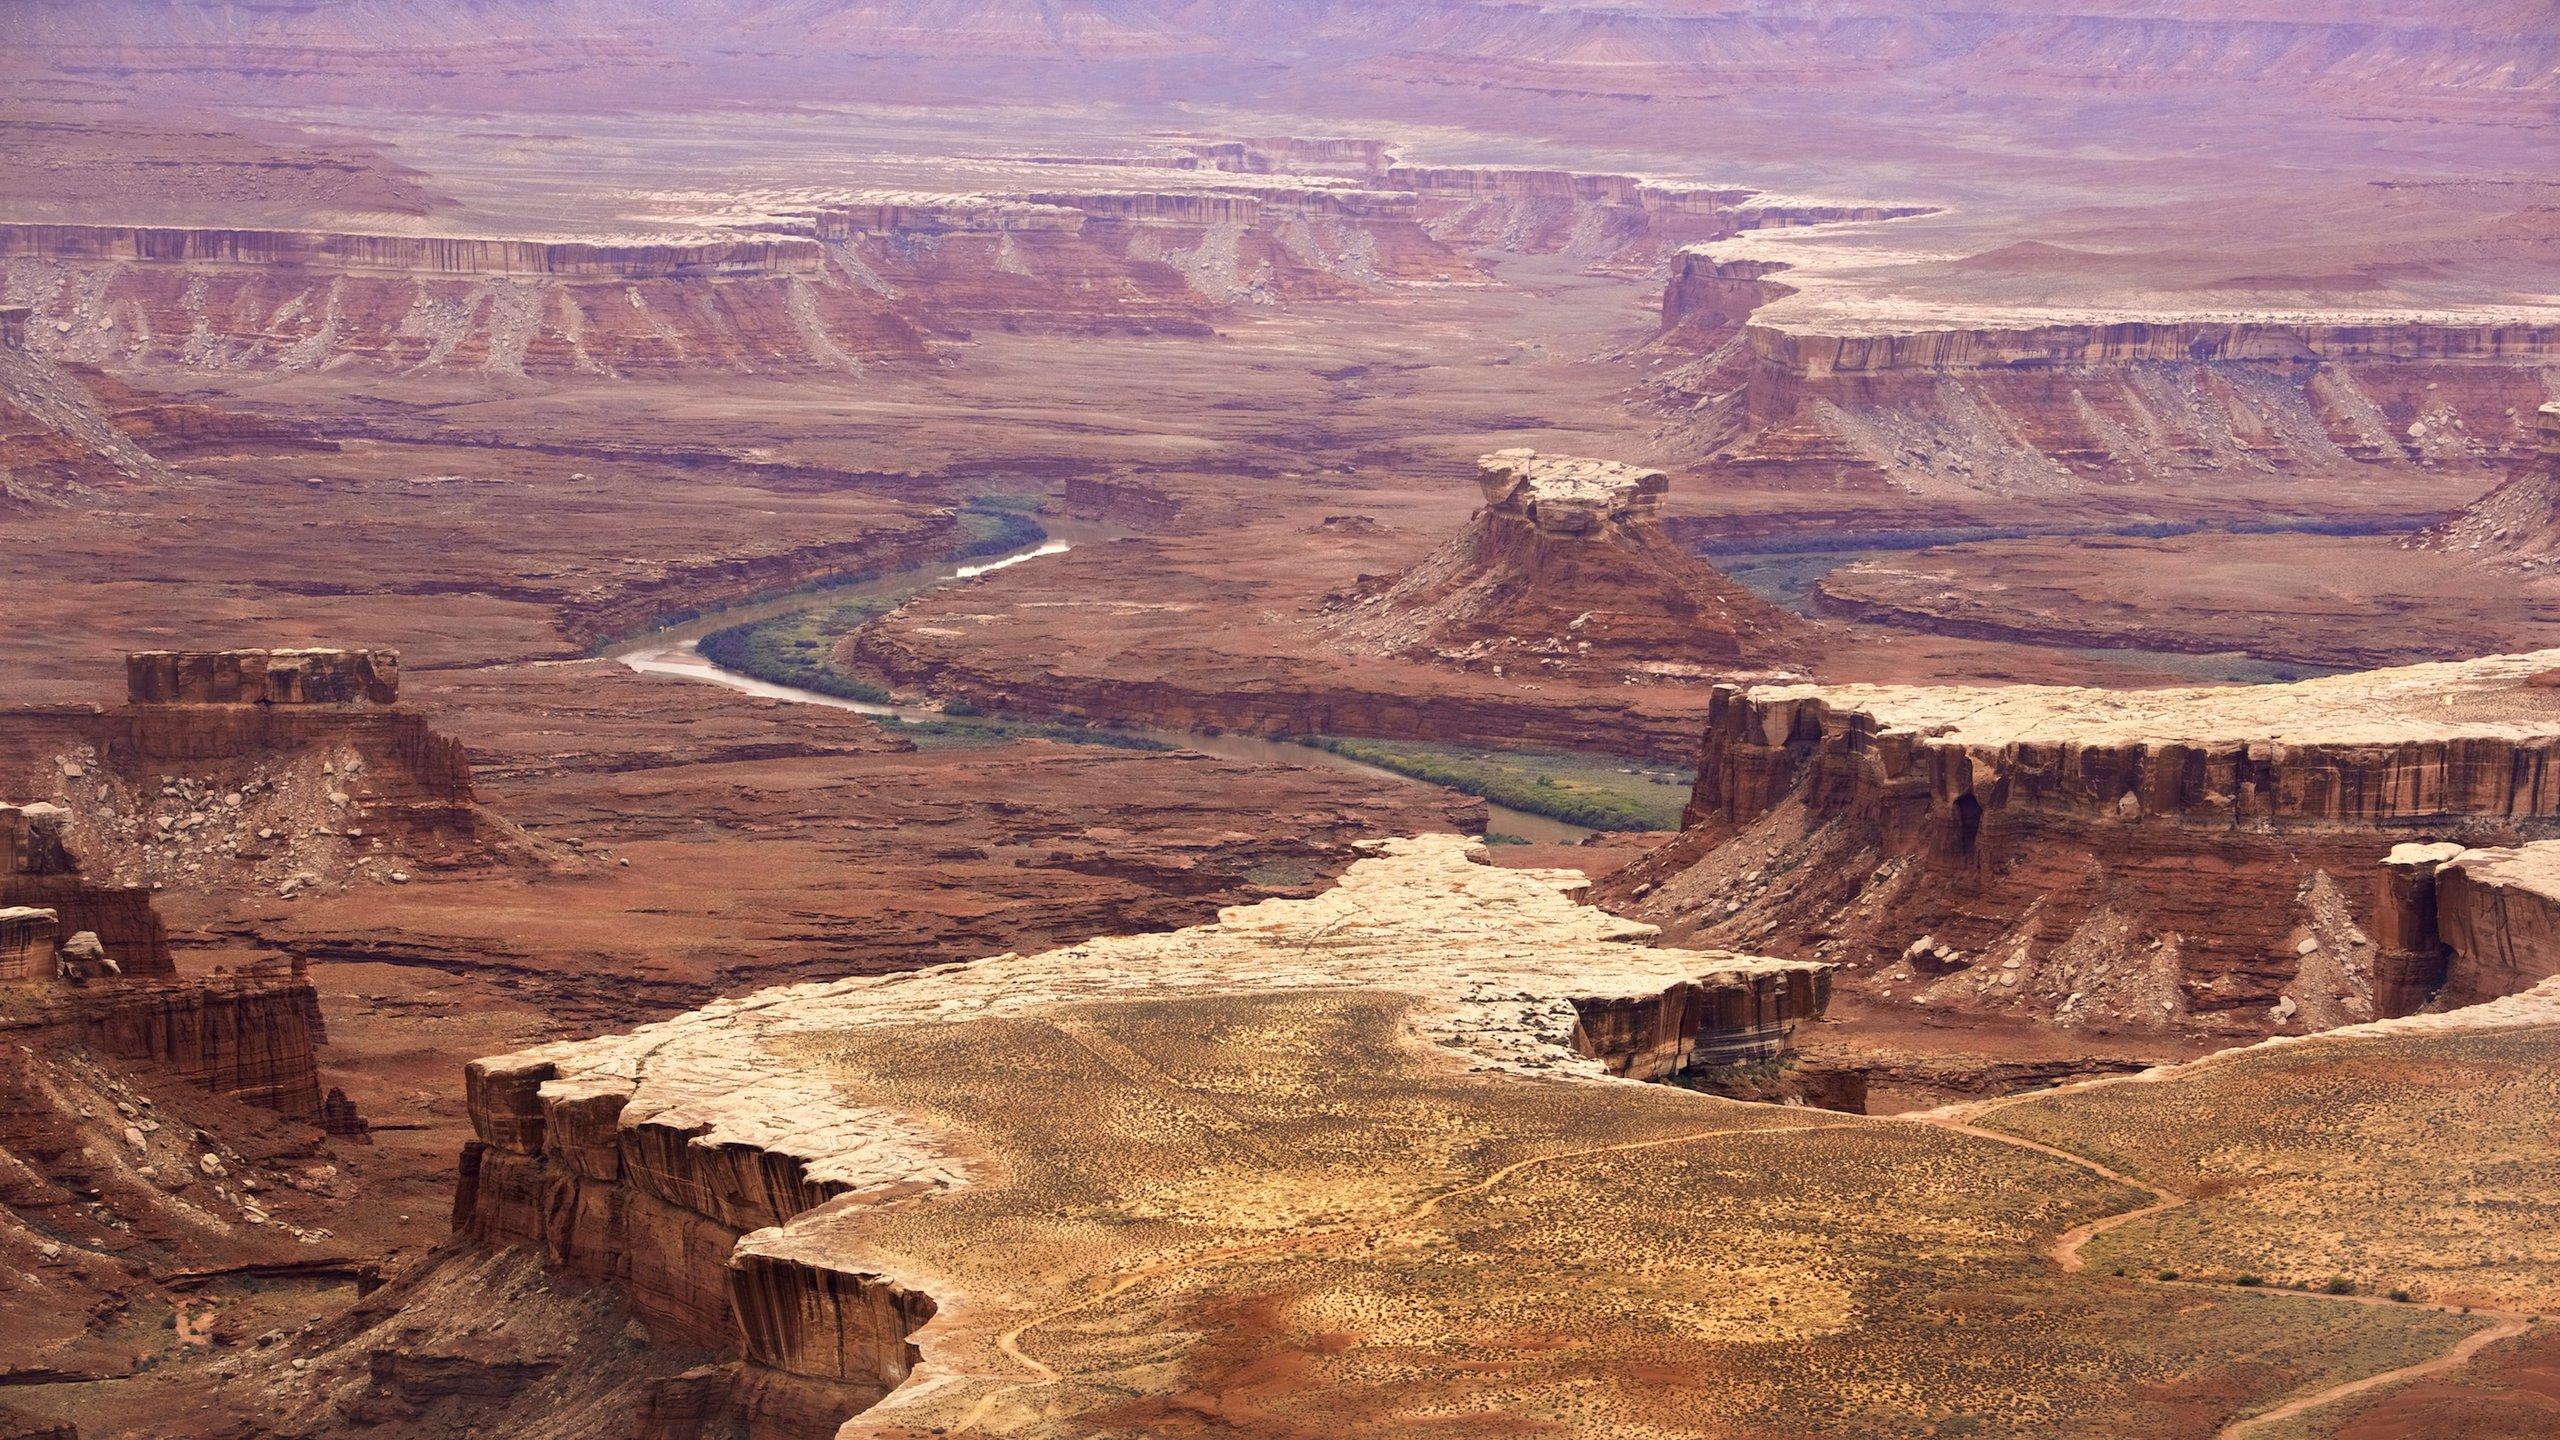 Canyonlands National Park, Moab, Utah, Verenigde Staten